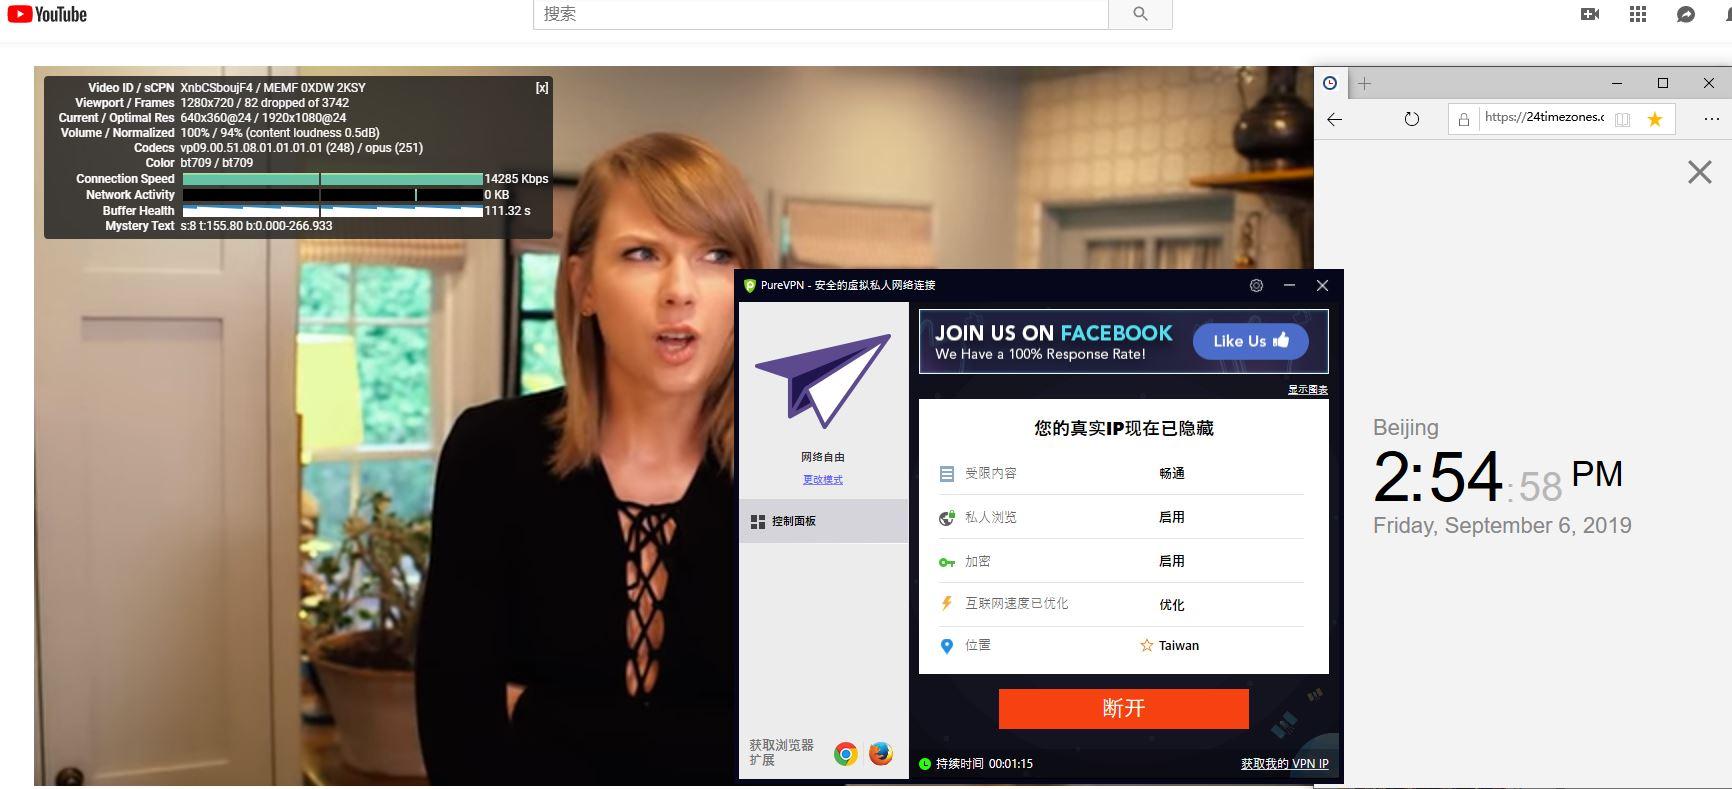 windows purevpn taiwan 服务器 中国vpn翻墙 科学上网 YouTube速度测试-20190906